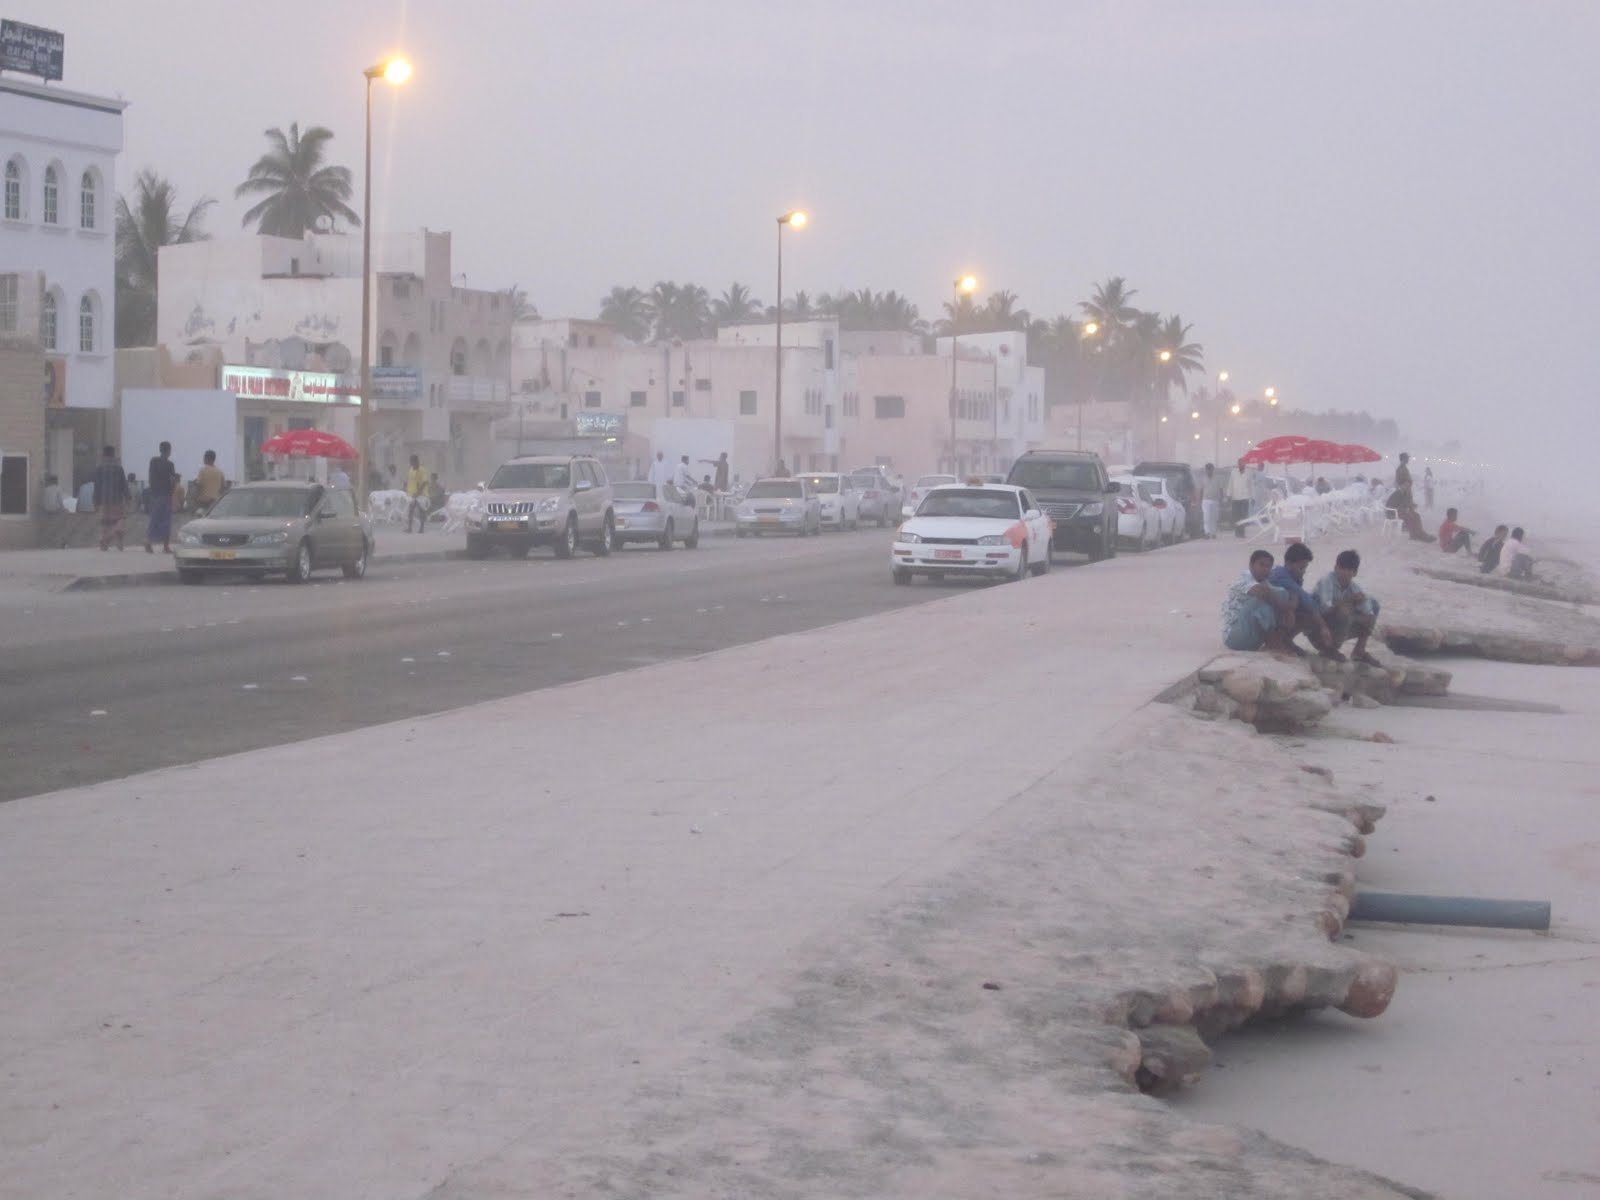 Sleepless in Salalah